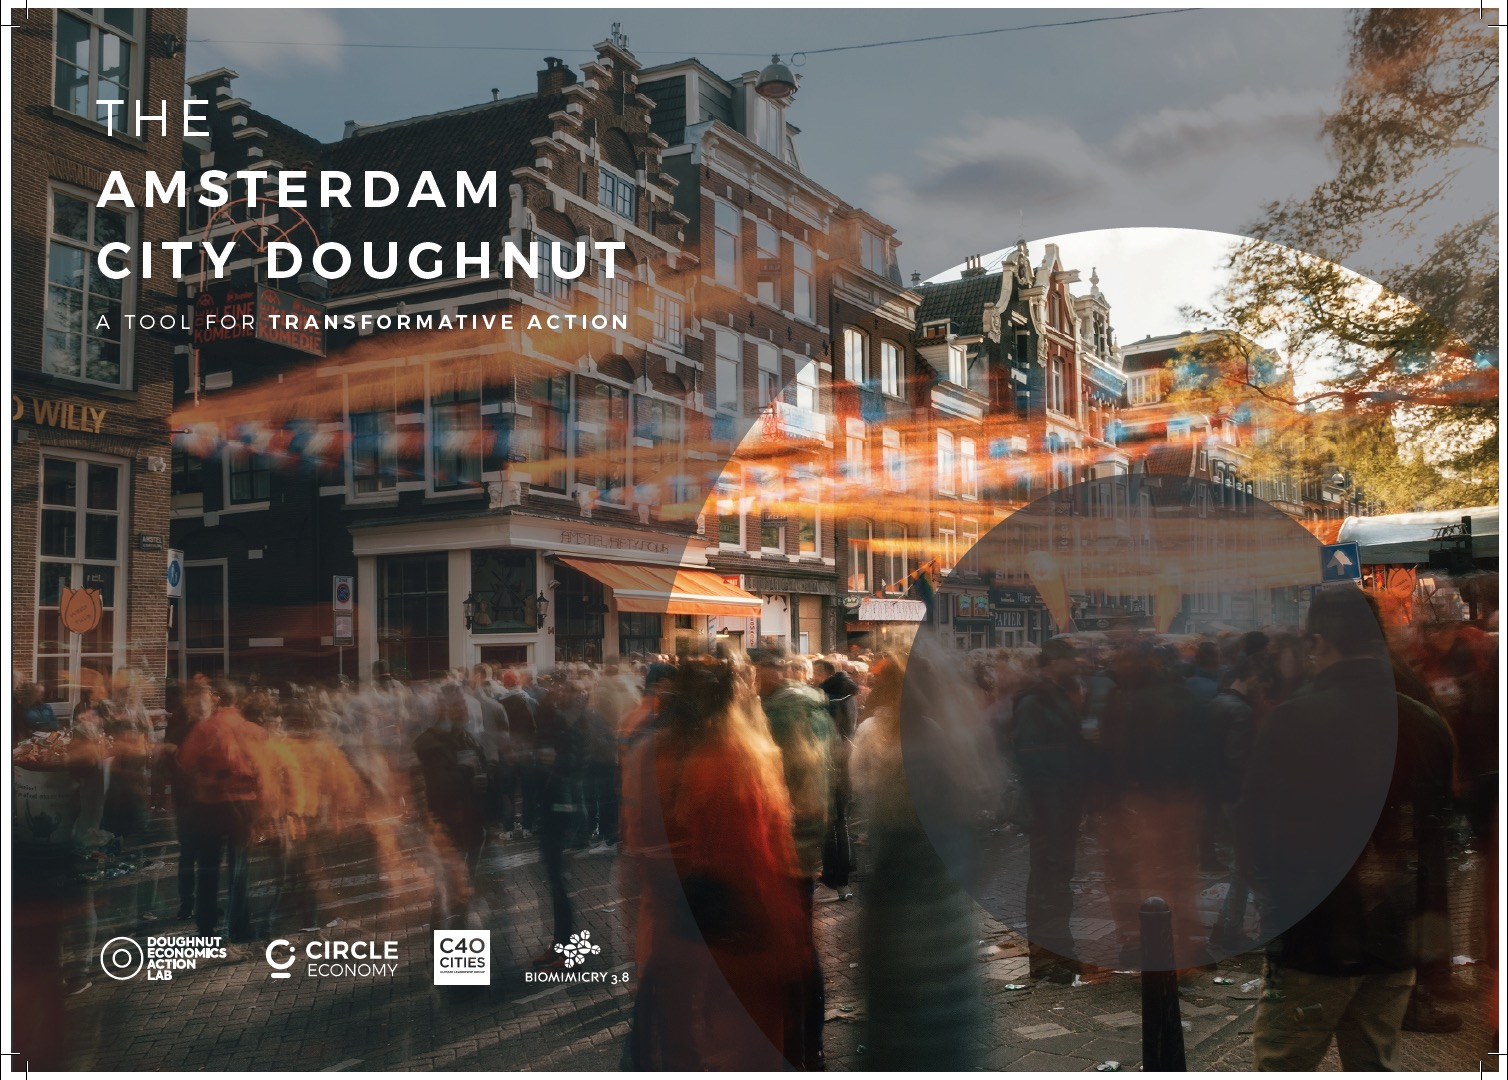 Introducing the Amsterdam City Doughnut   Kate Raworth